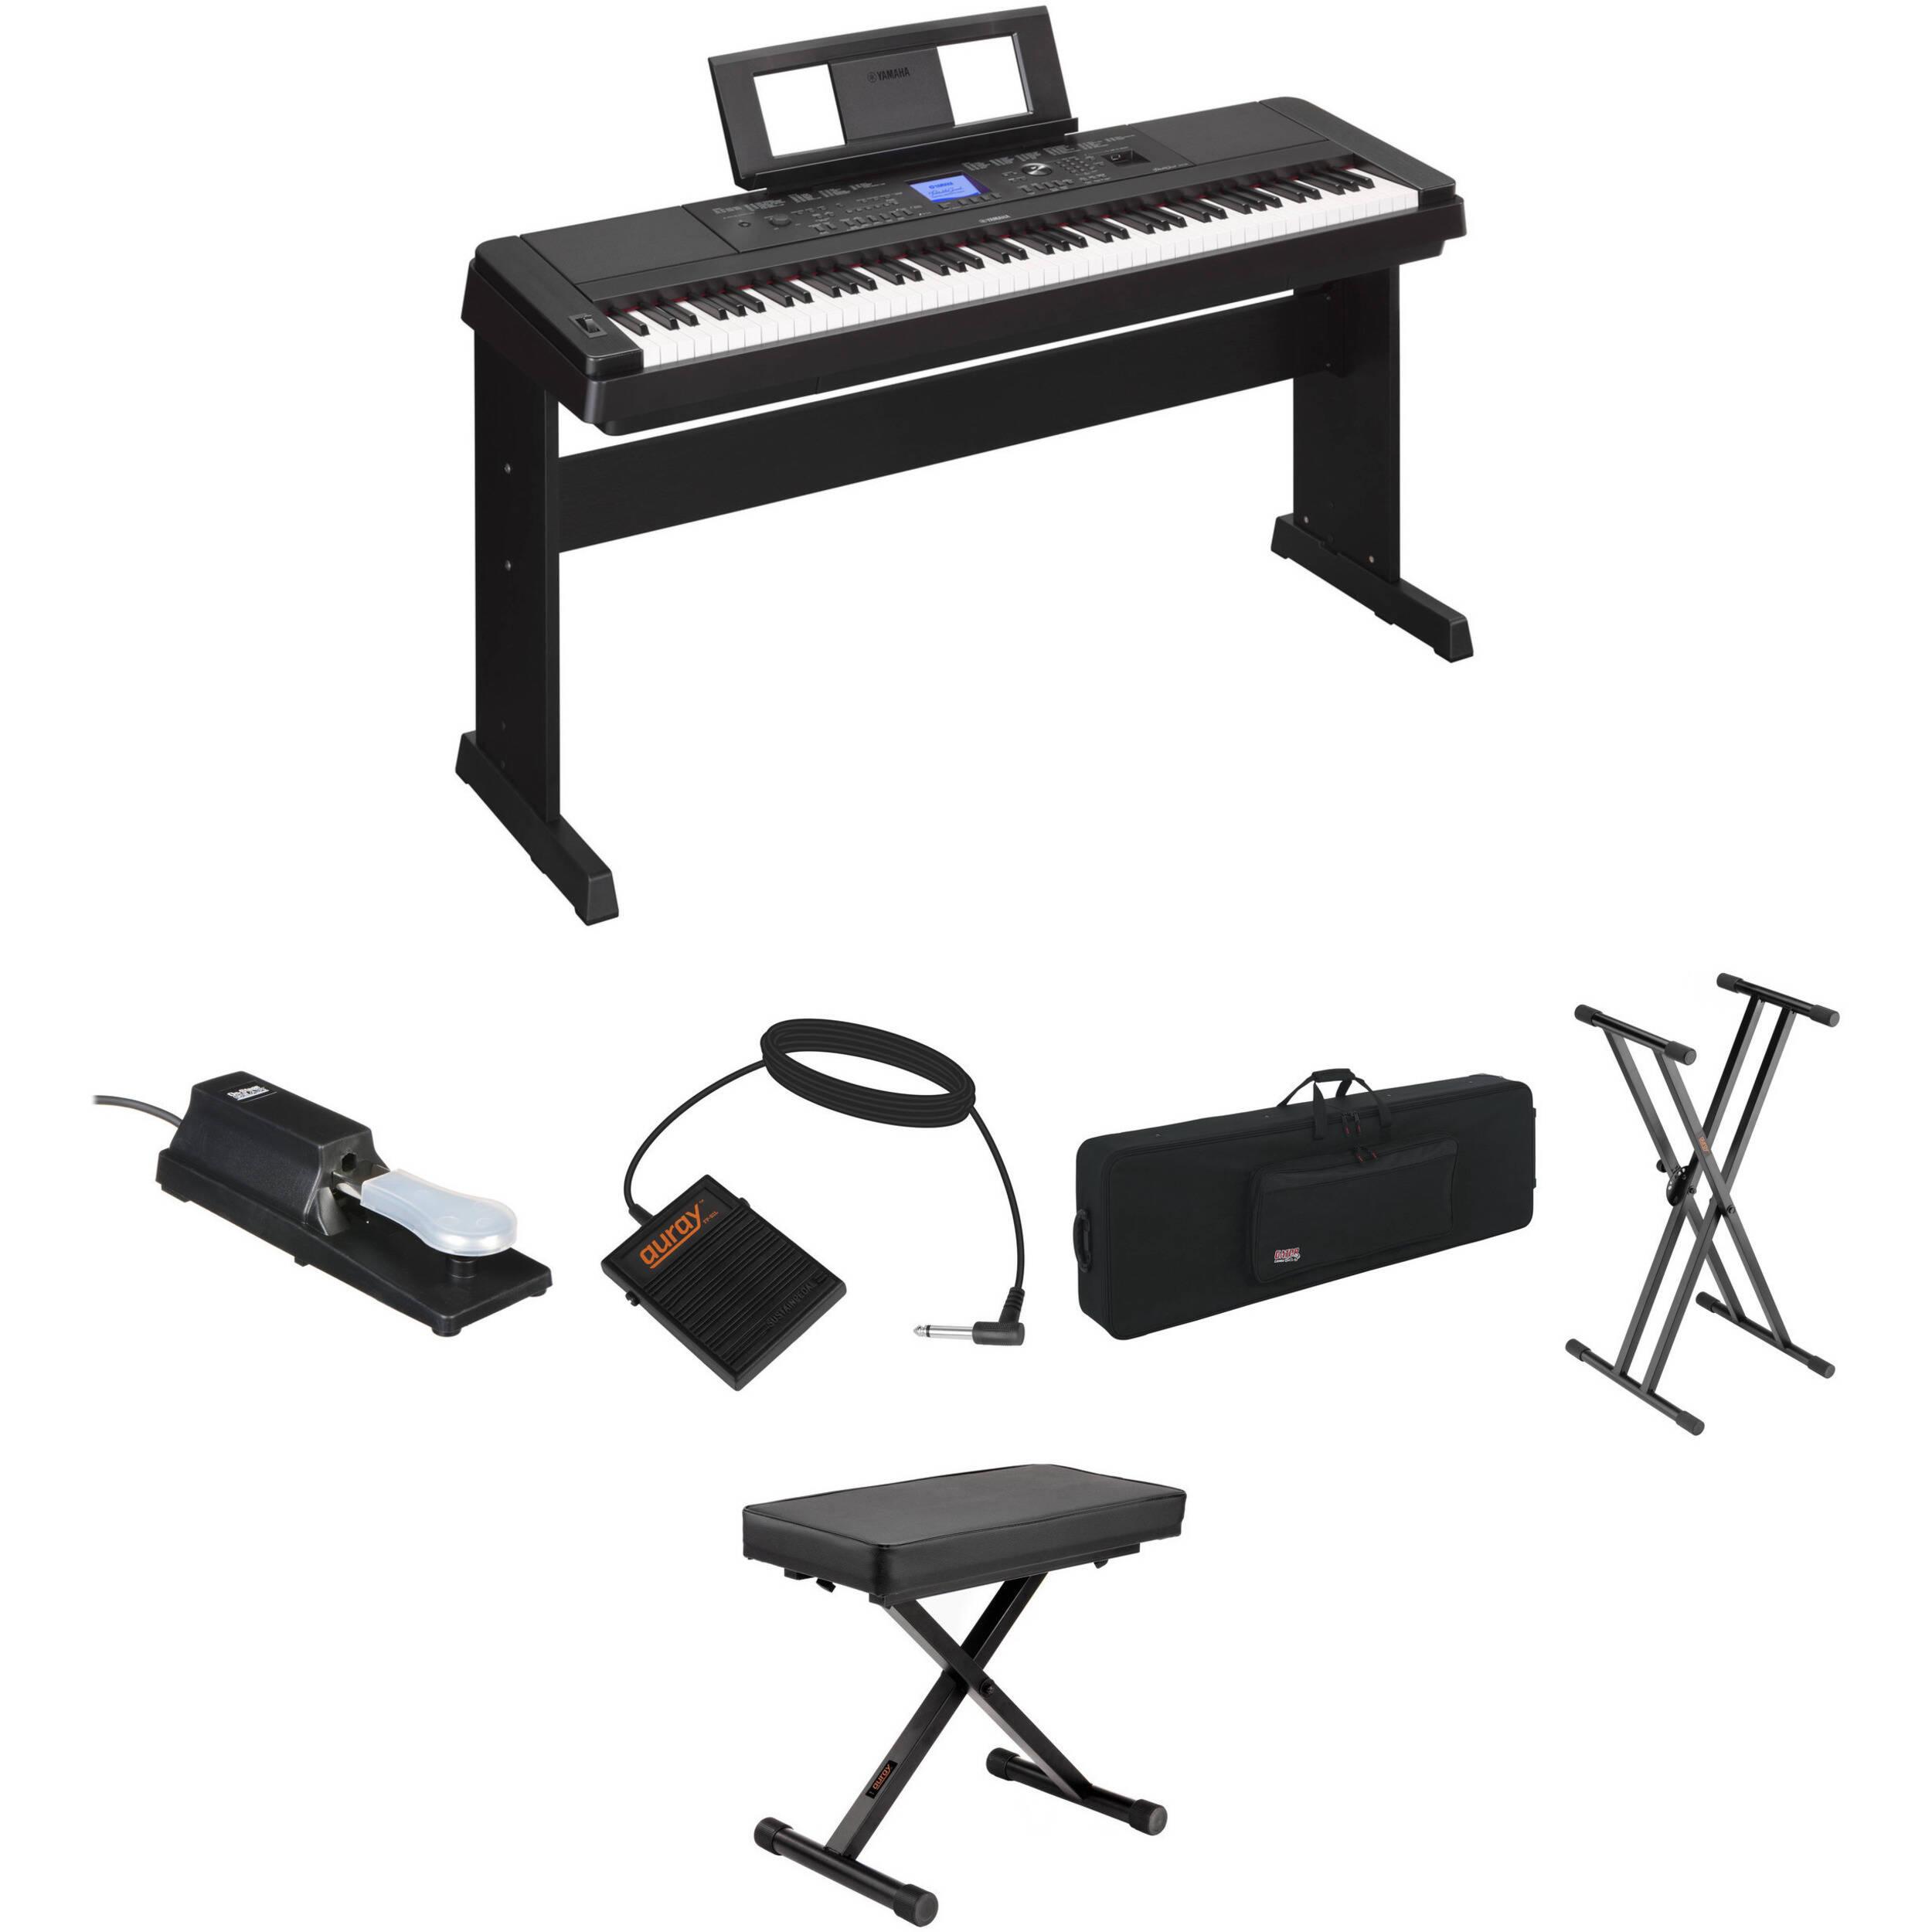 Yamaha DGX-660 Portable Grand Digital Piano (Black)